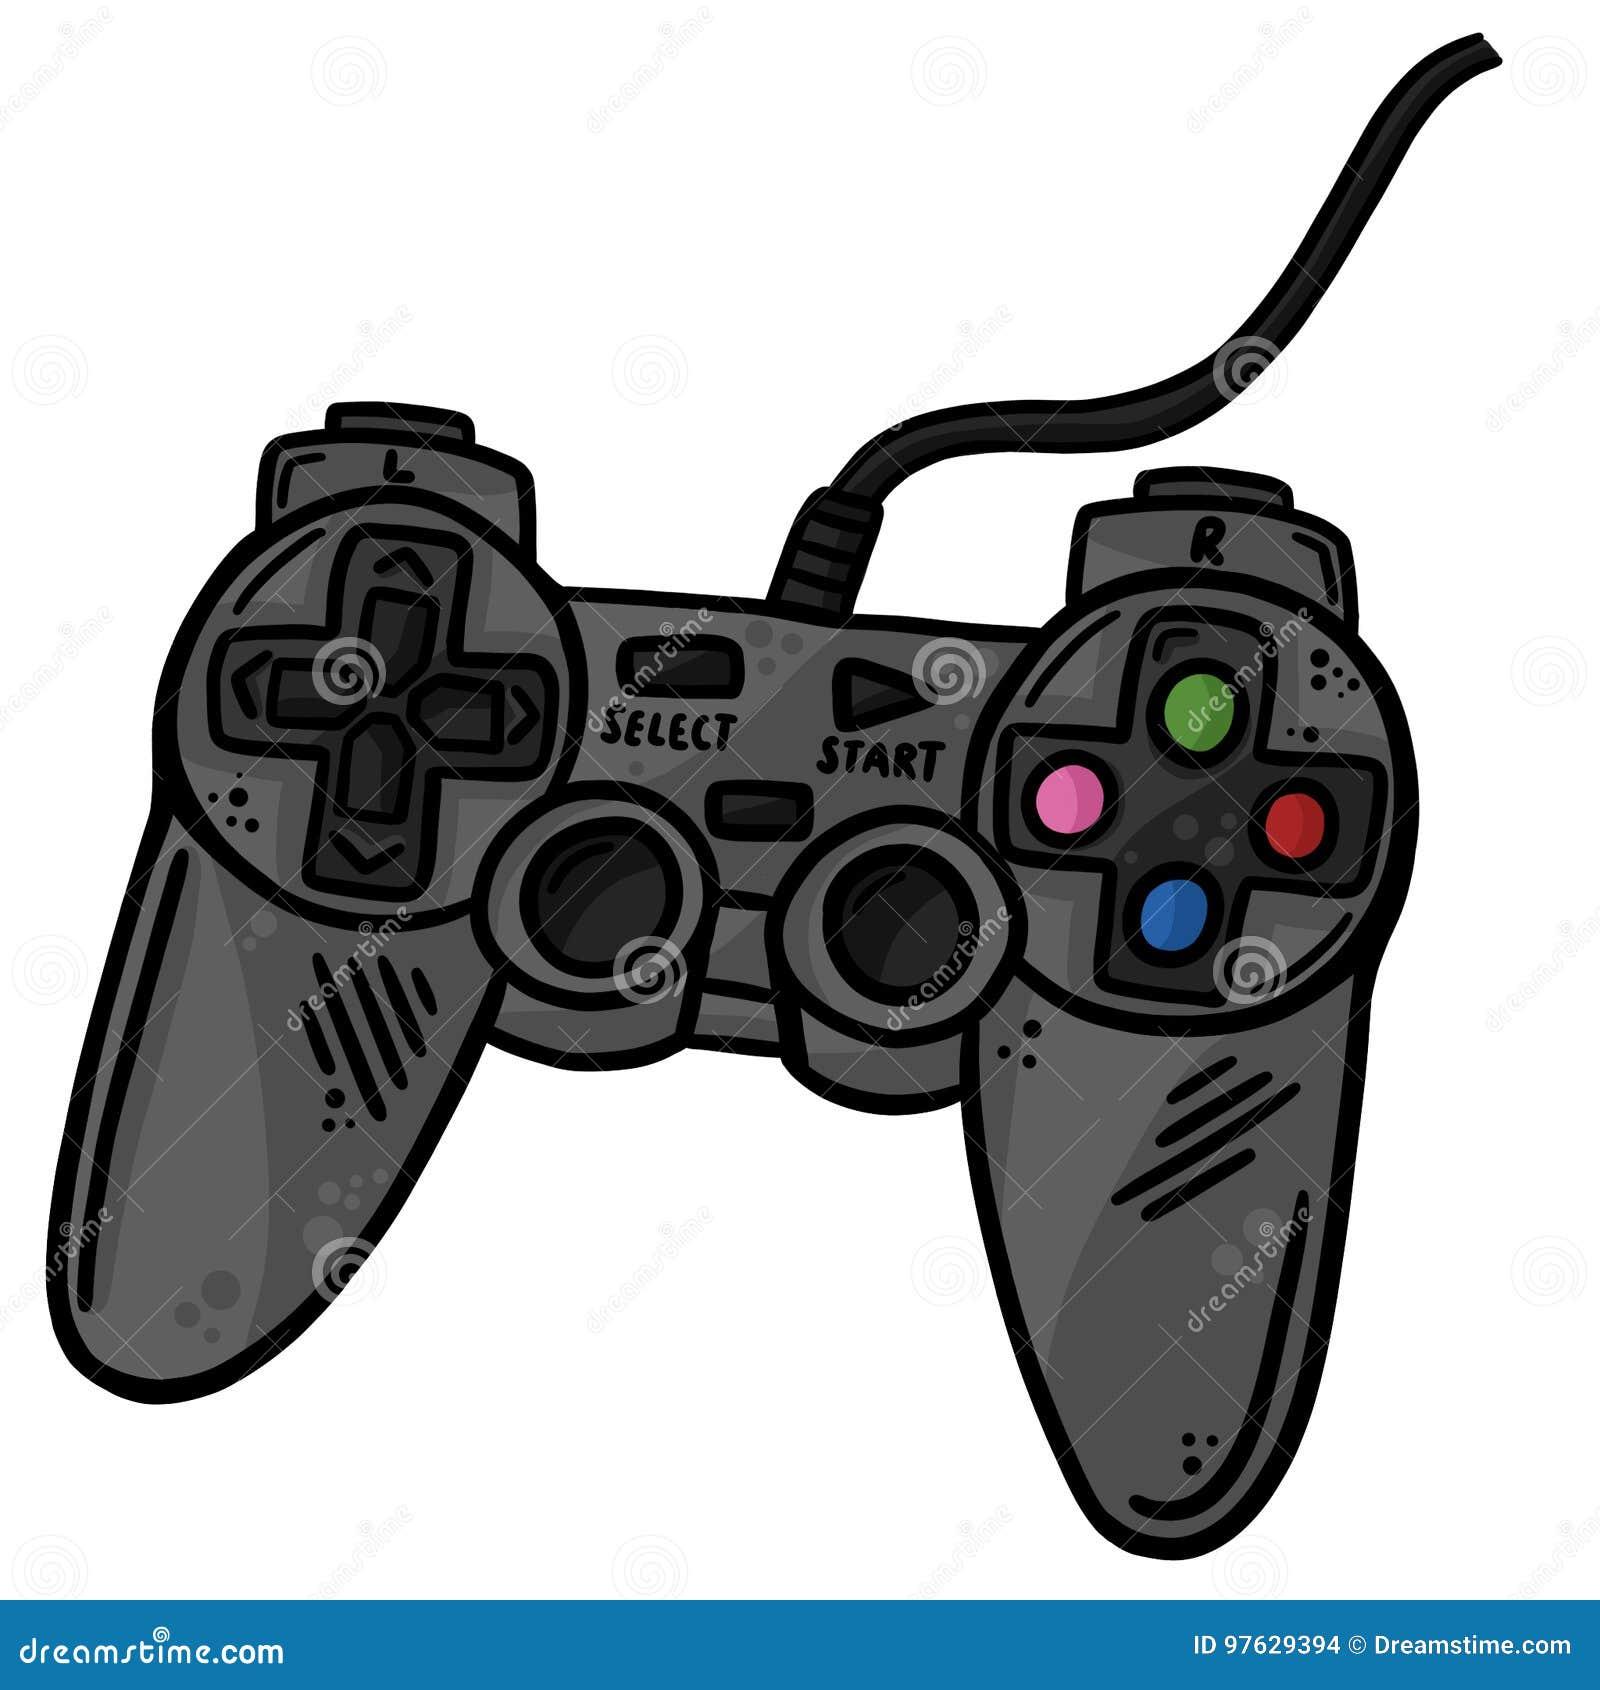 Regulador Remote Line Art Vector Illustration Clip Art del juego